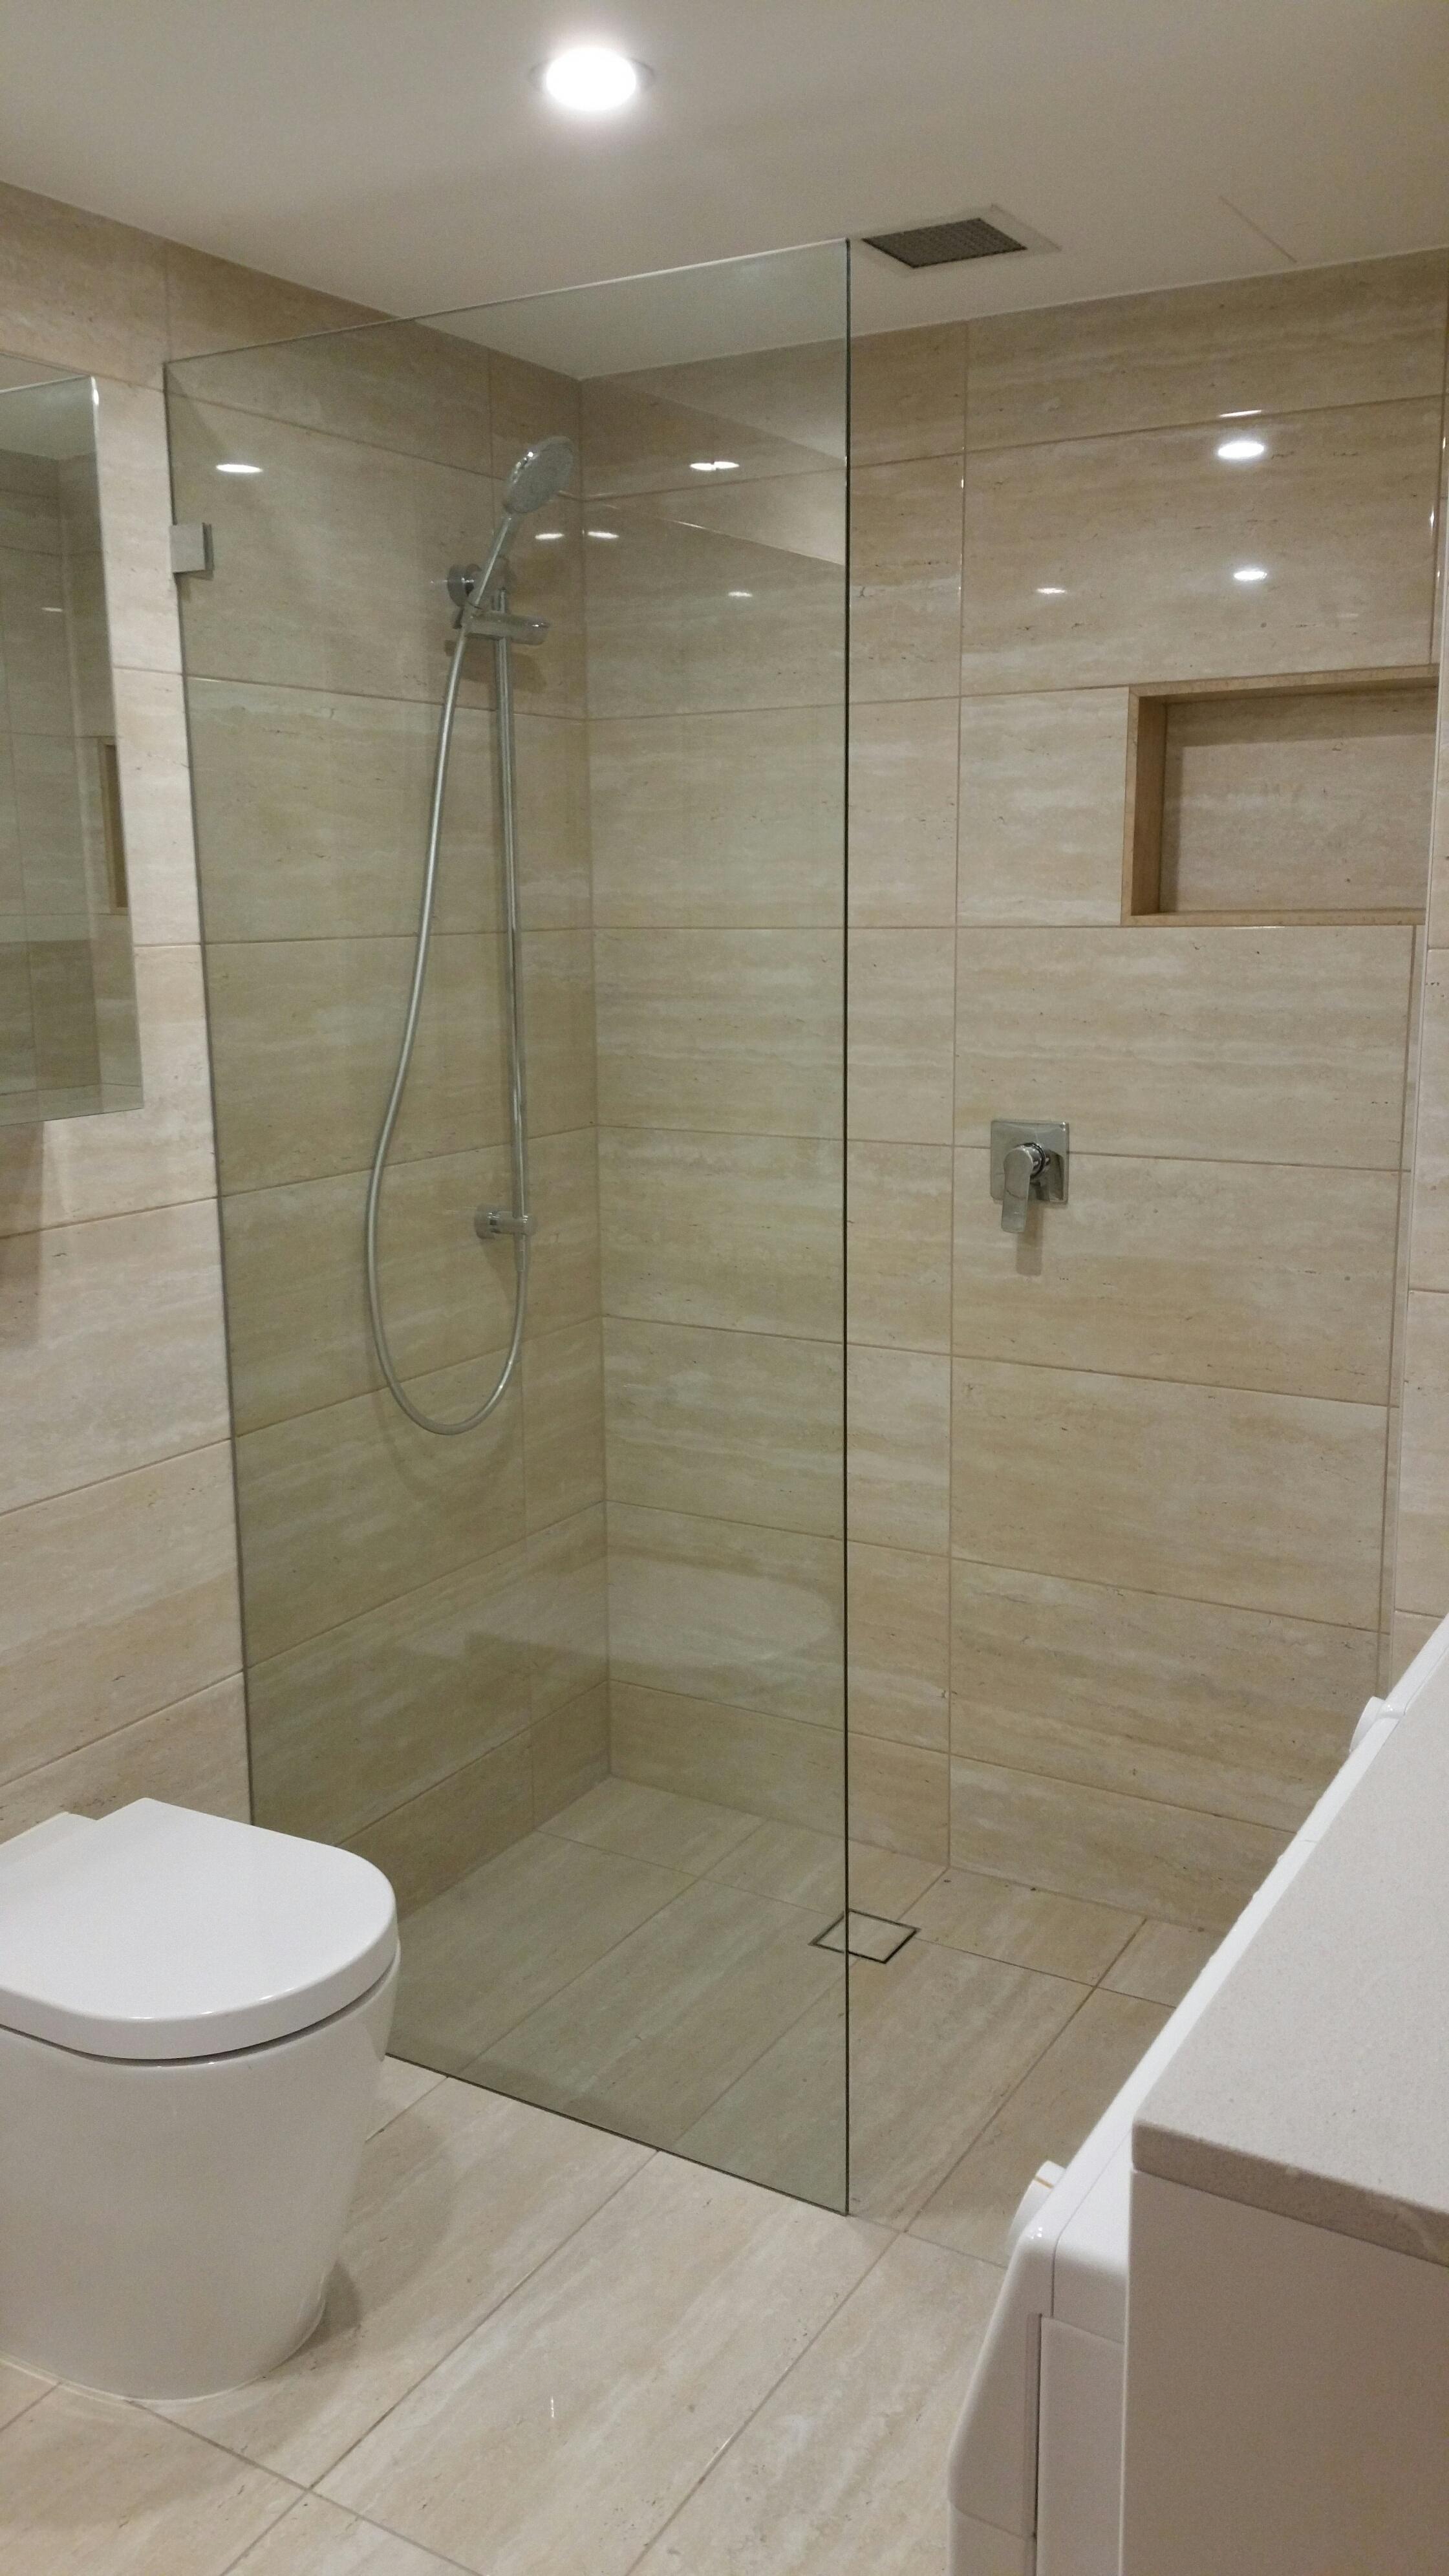 Luke s bathroom ensuite renovation photos for Renovations sydney